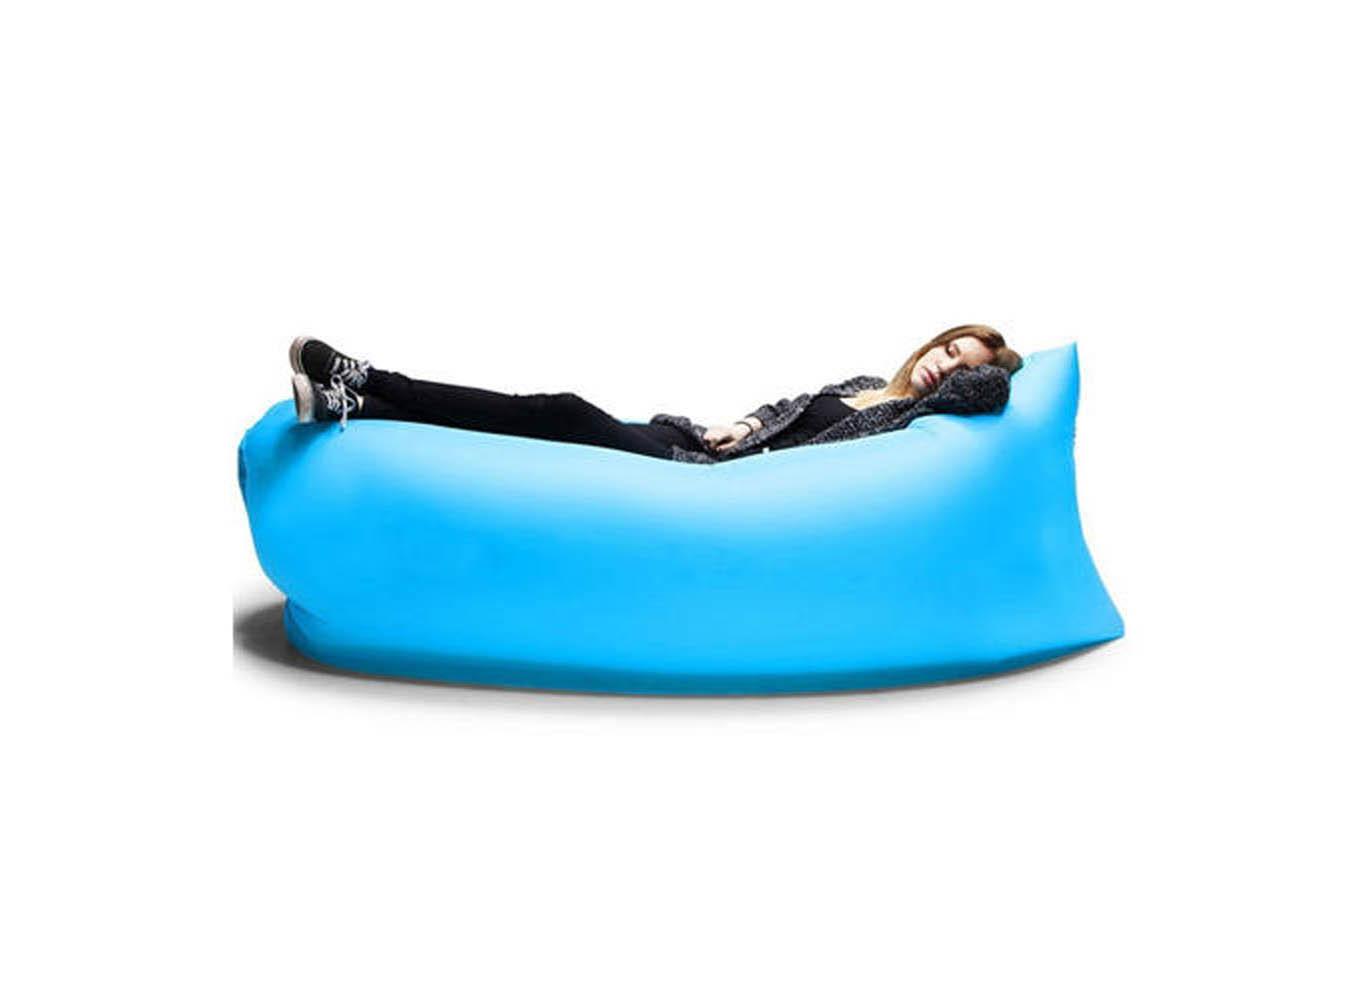 Custom Color Inflatable Beach Lounger Bag